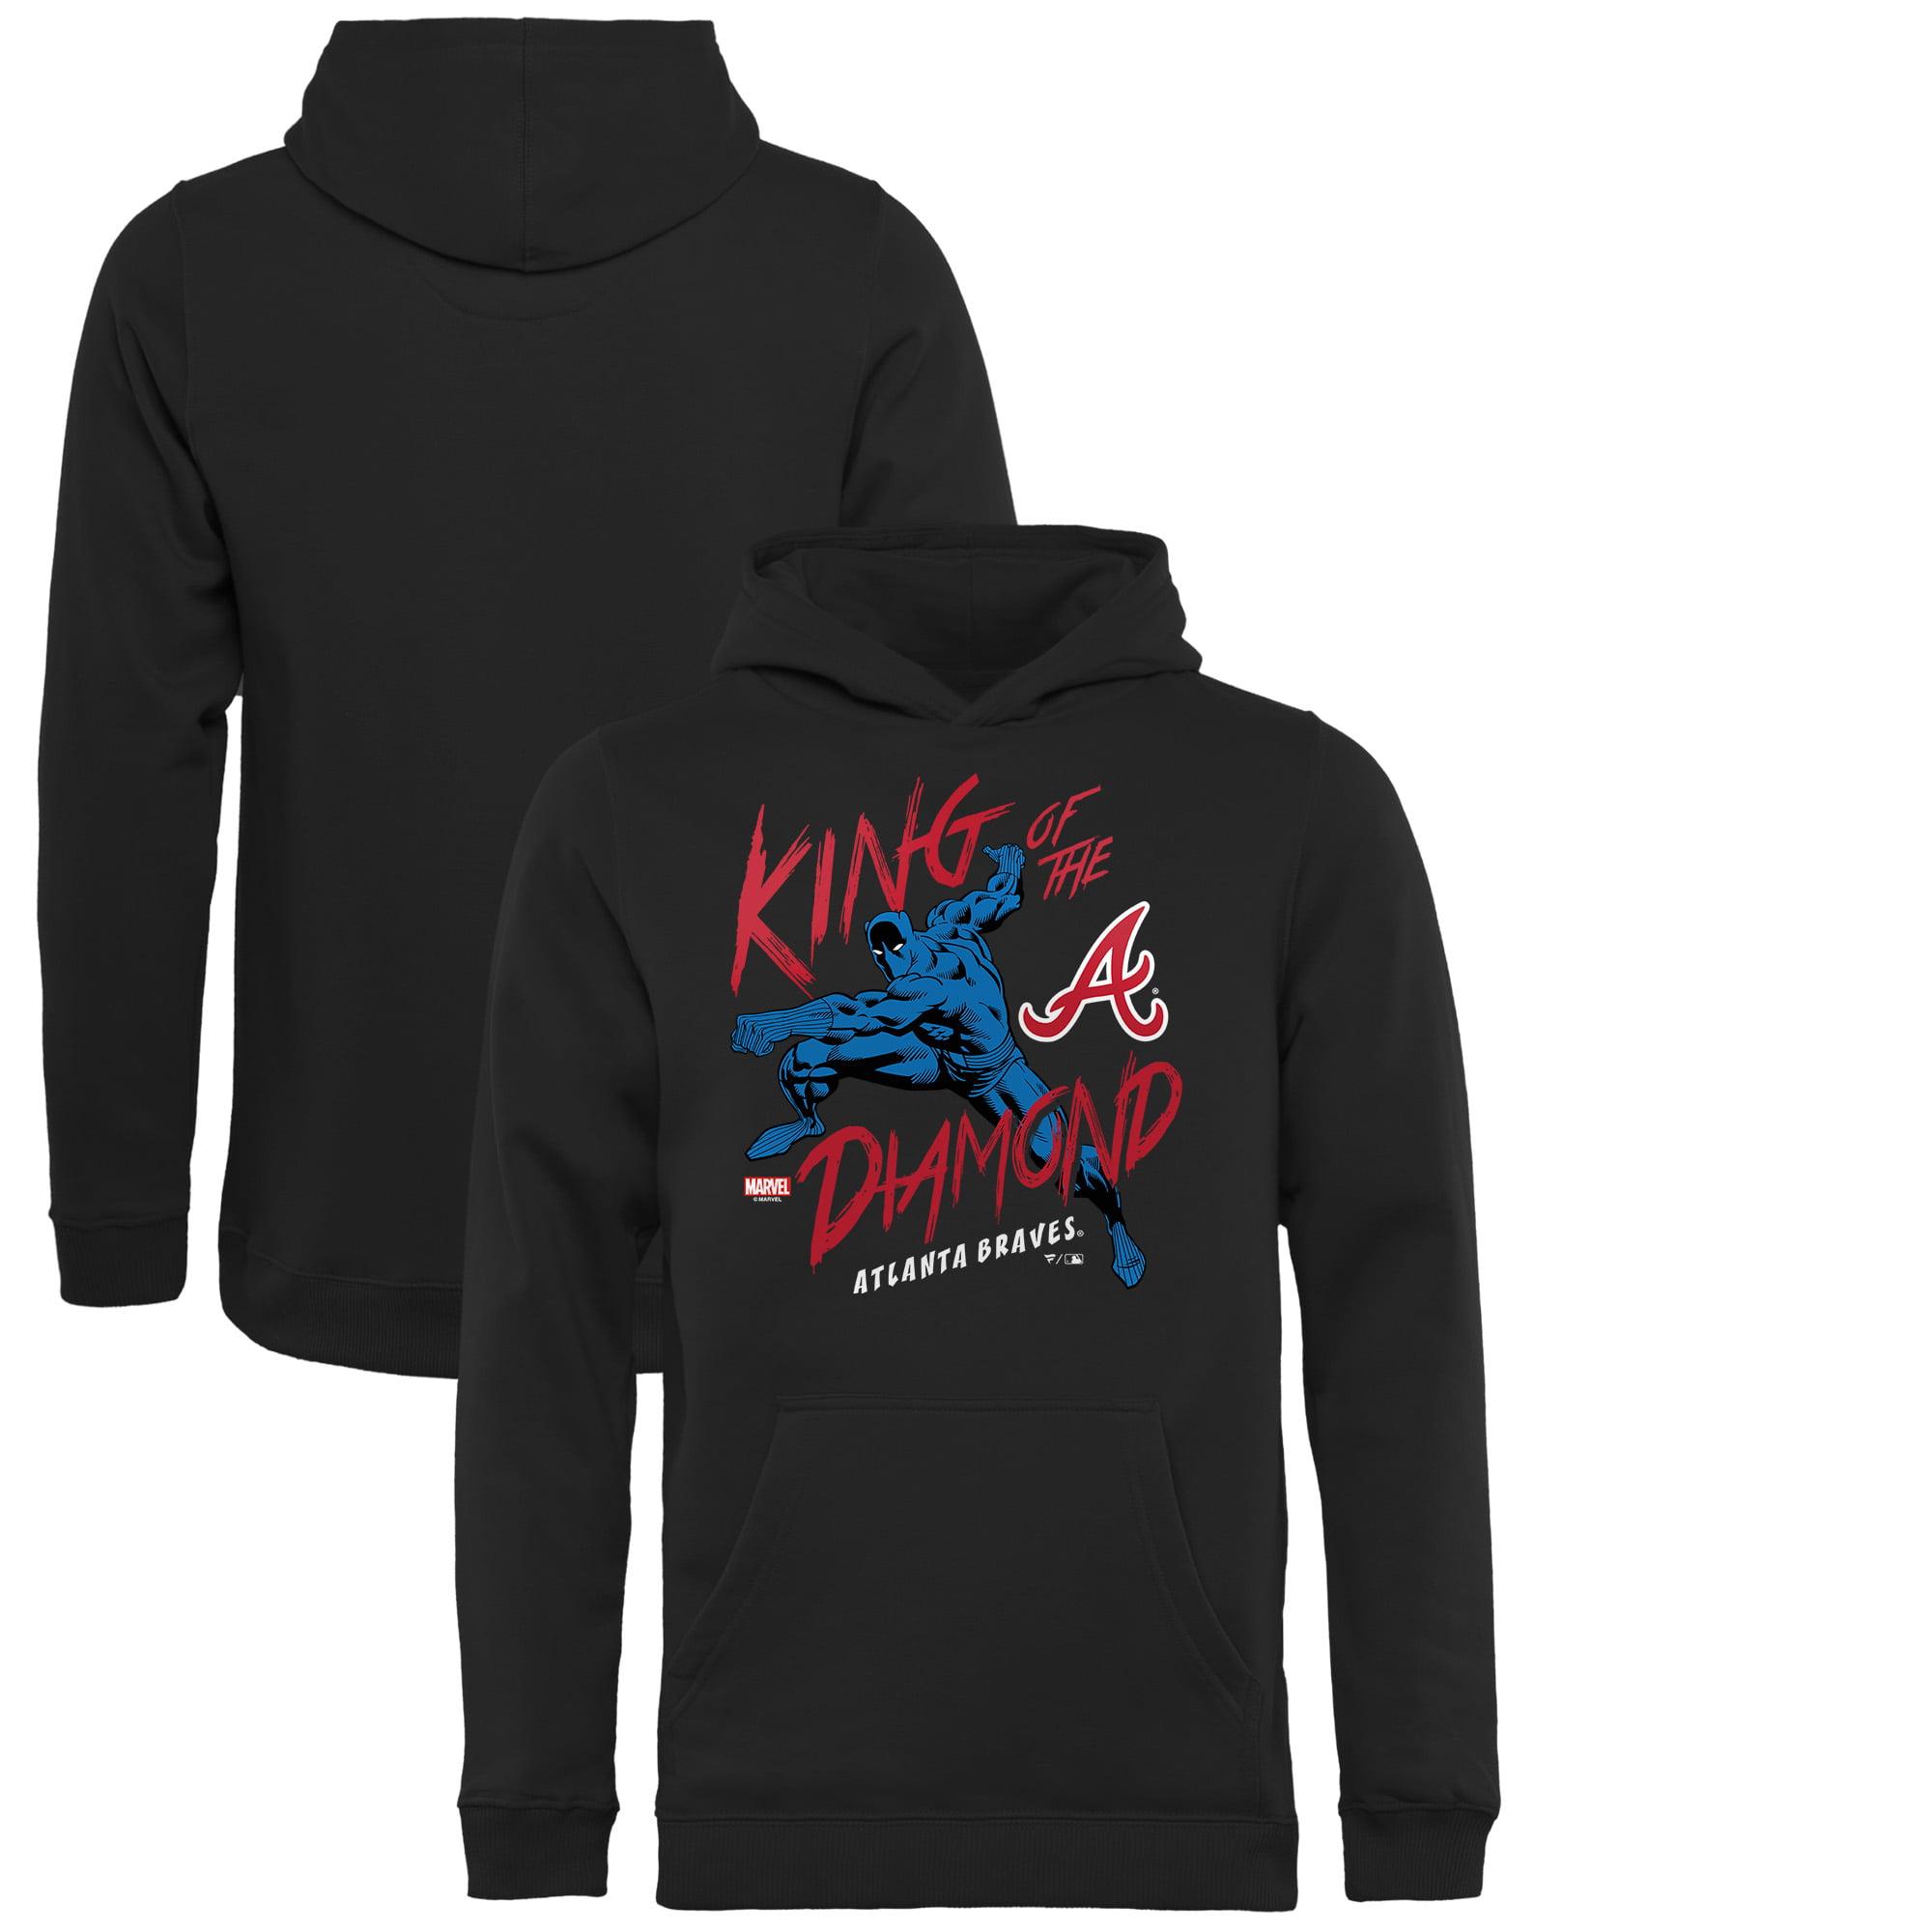 Atlanta Braves Fanatics Branded Youth MLB Marvel Black Panther King of the Diamond Pullover Hoodie - Black